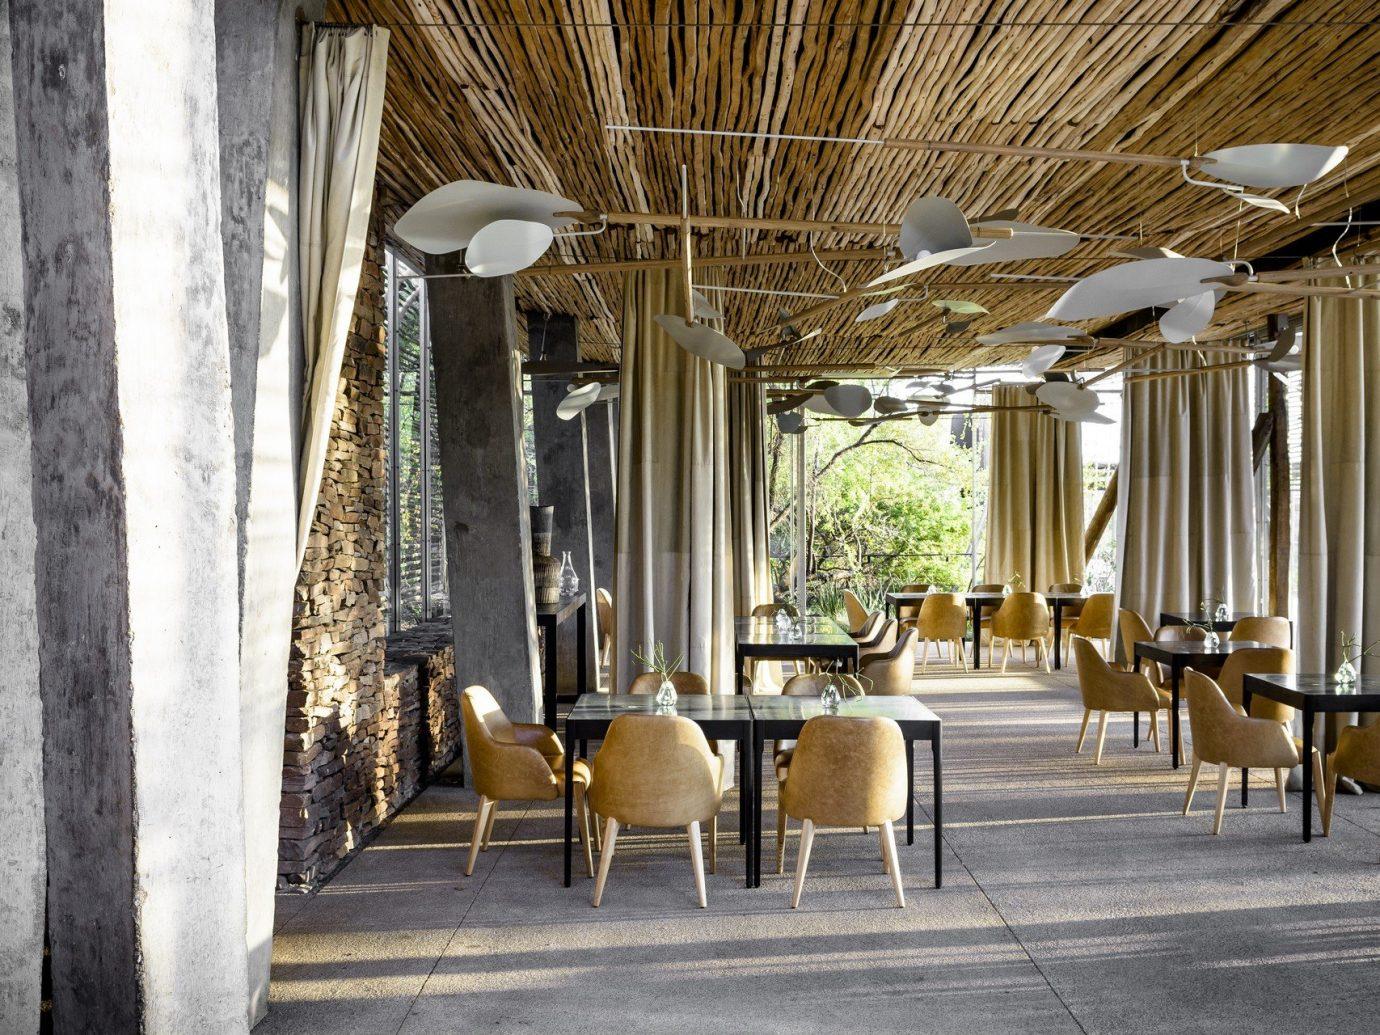 Hotels indoor room house estate Architecture interior design home lighting restaurant palace furniture